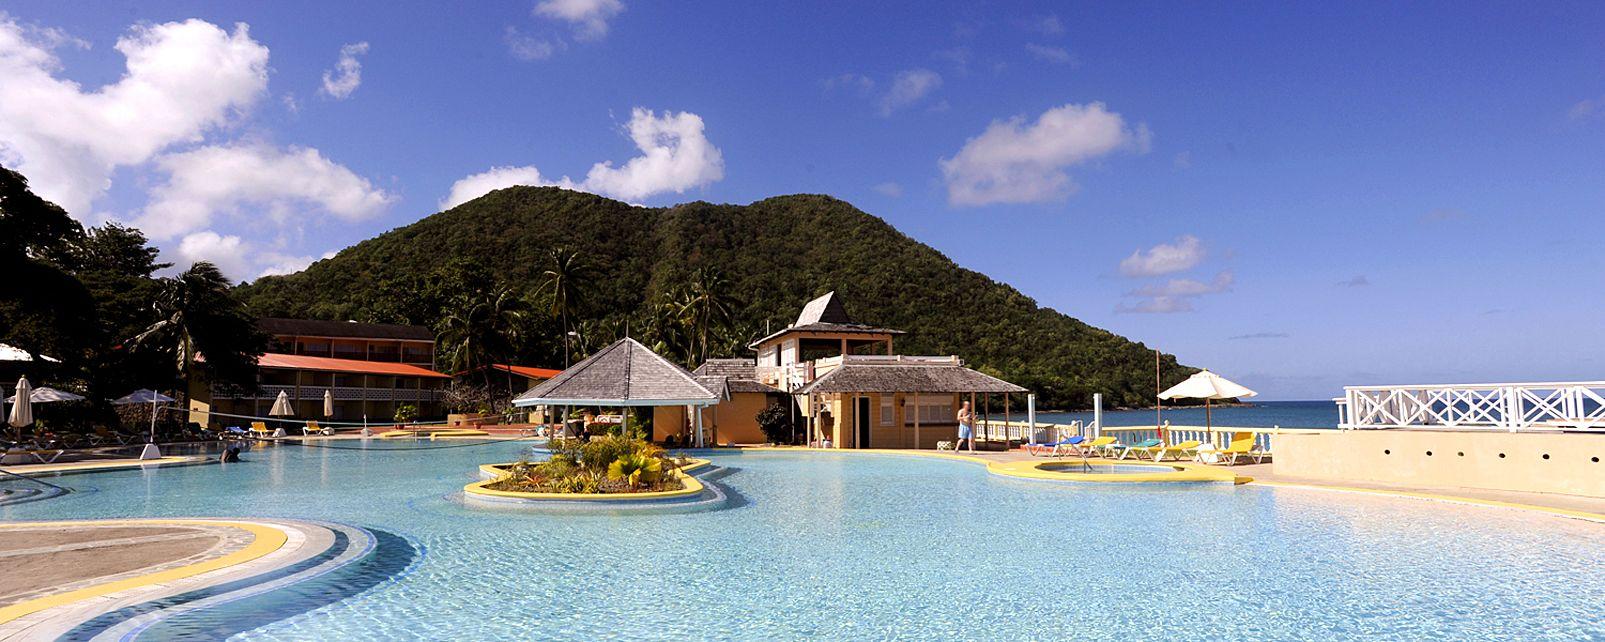 Rex St Lucian Hotel Rodney Bay